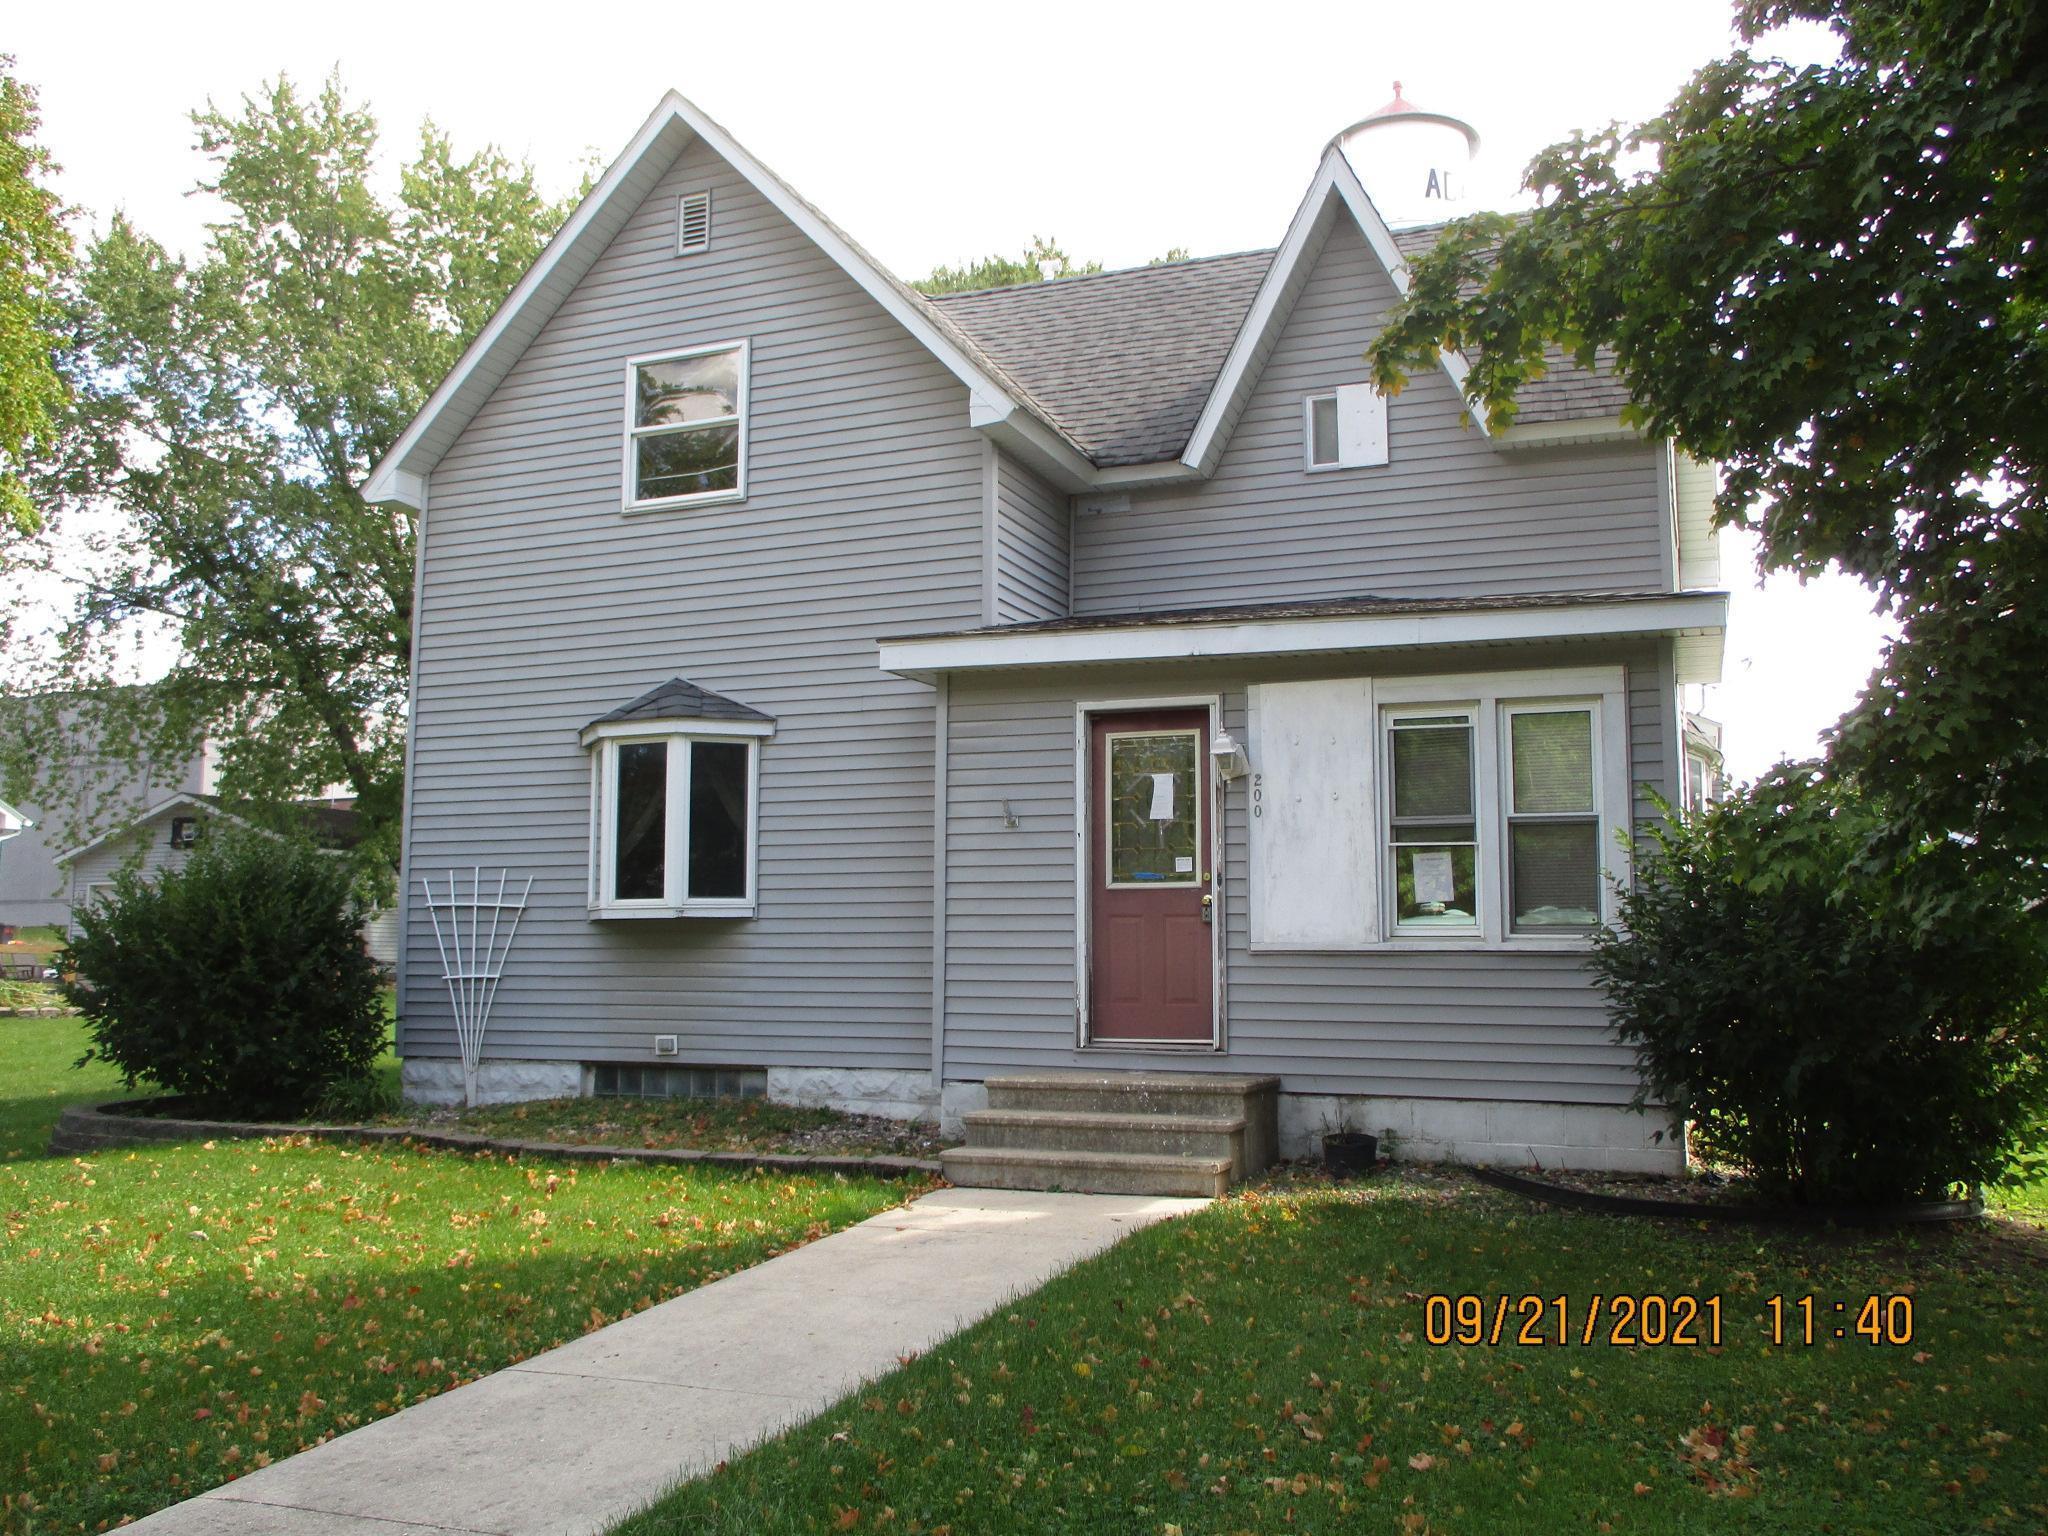 200 NW 4th Street, Adams, MN 55909